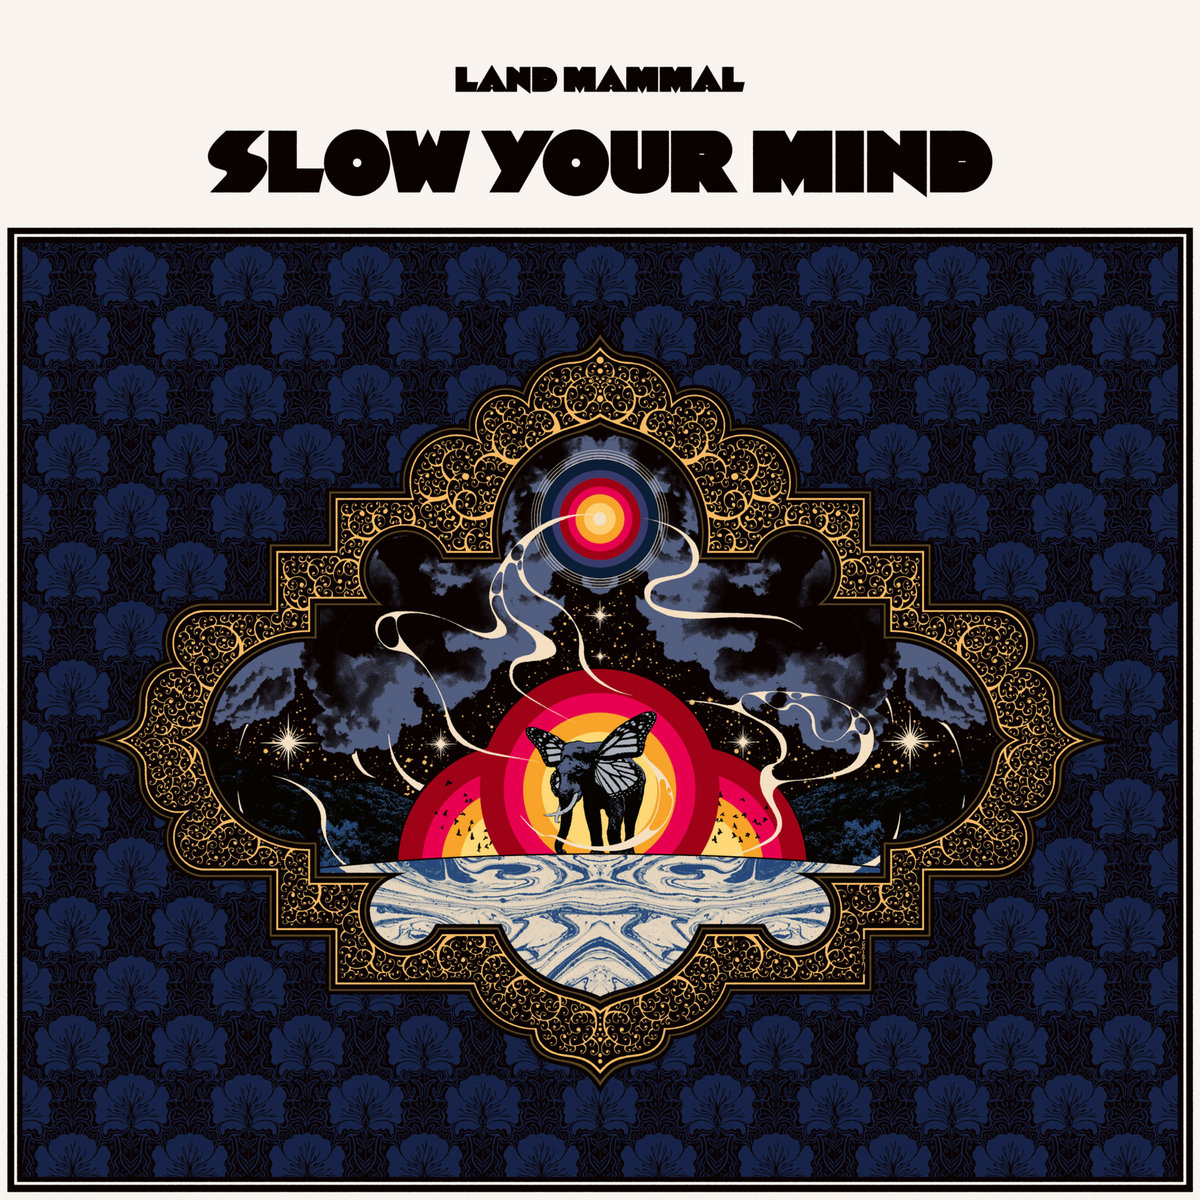 Reseña: LAND MAMMAL.- 'Slow yourmind'